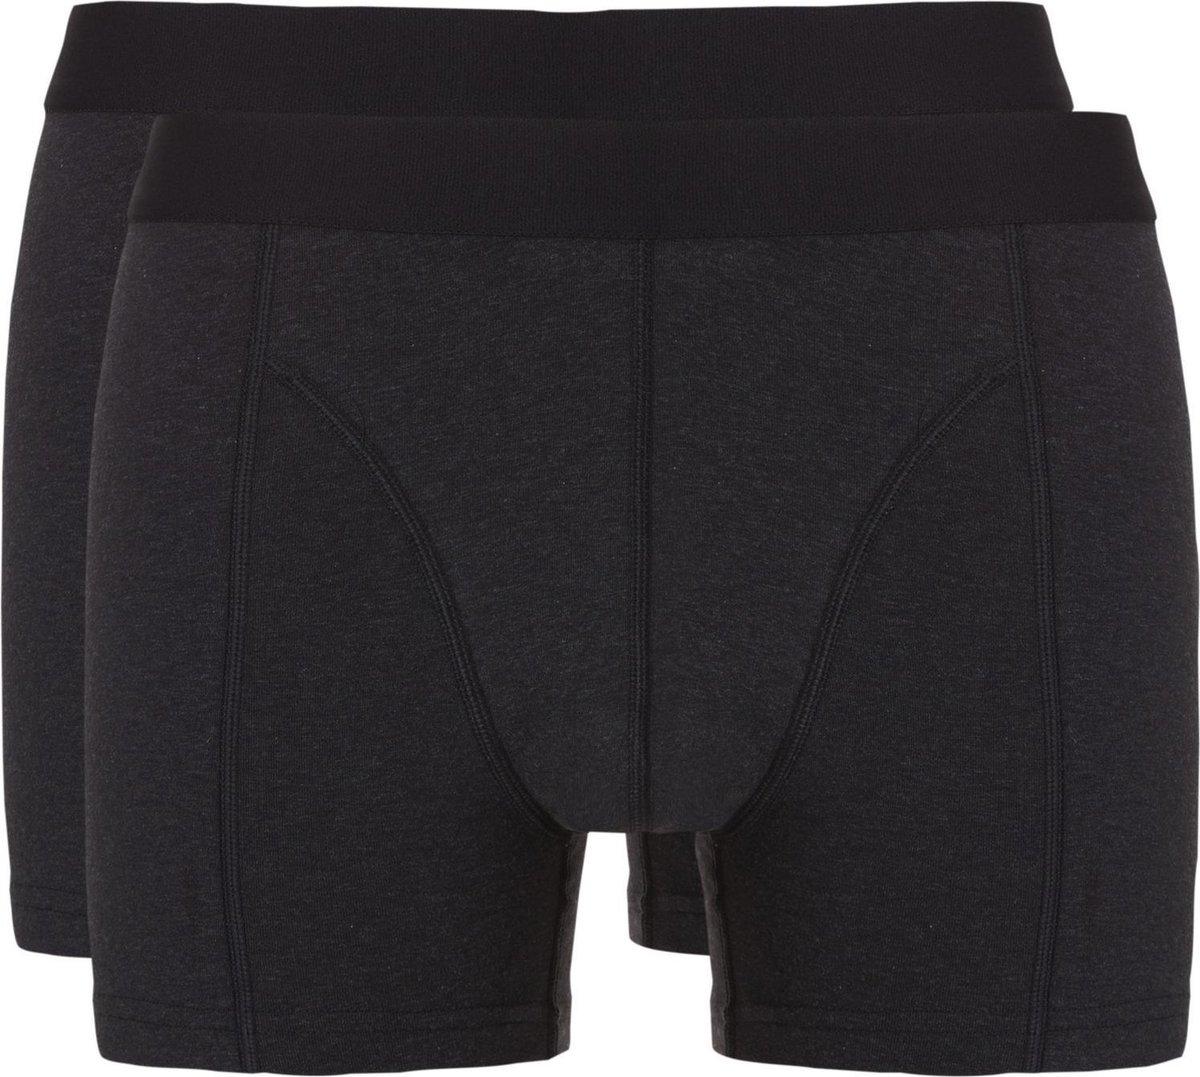 Ten Cate Short 2Pack Fine Zwart - Maat M